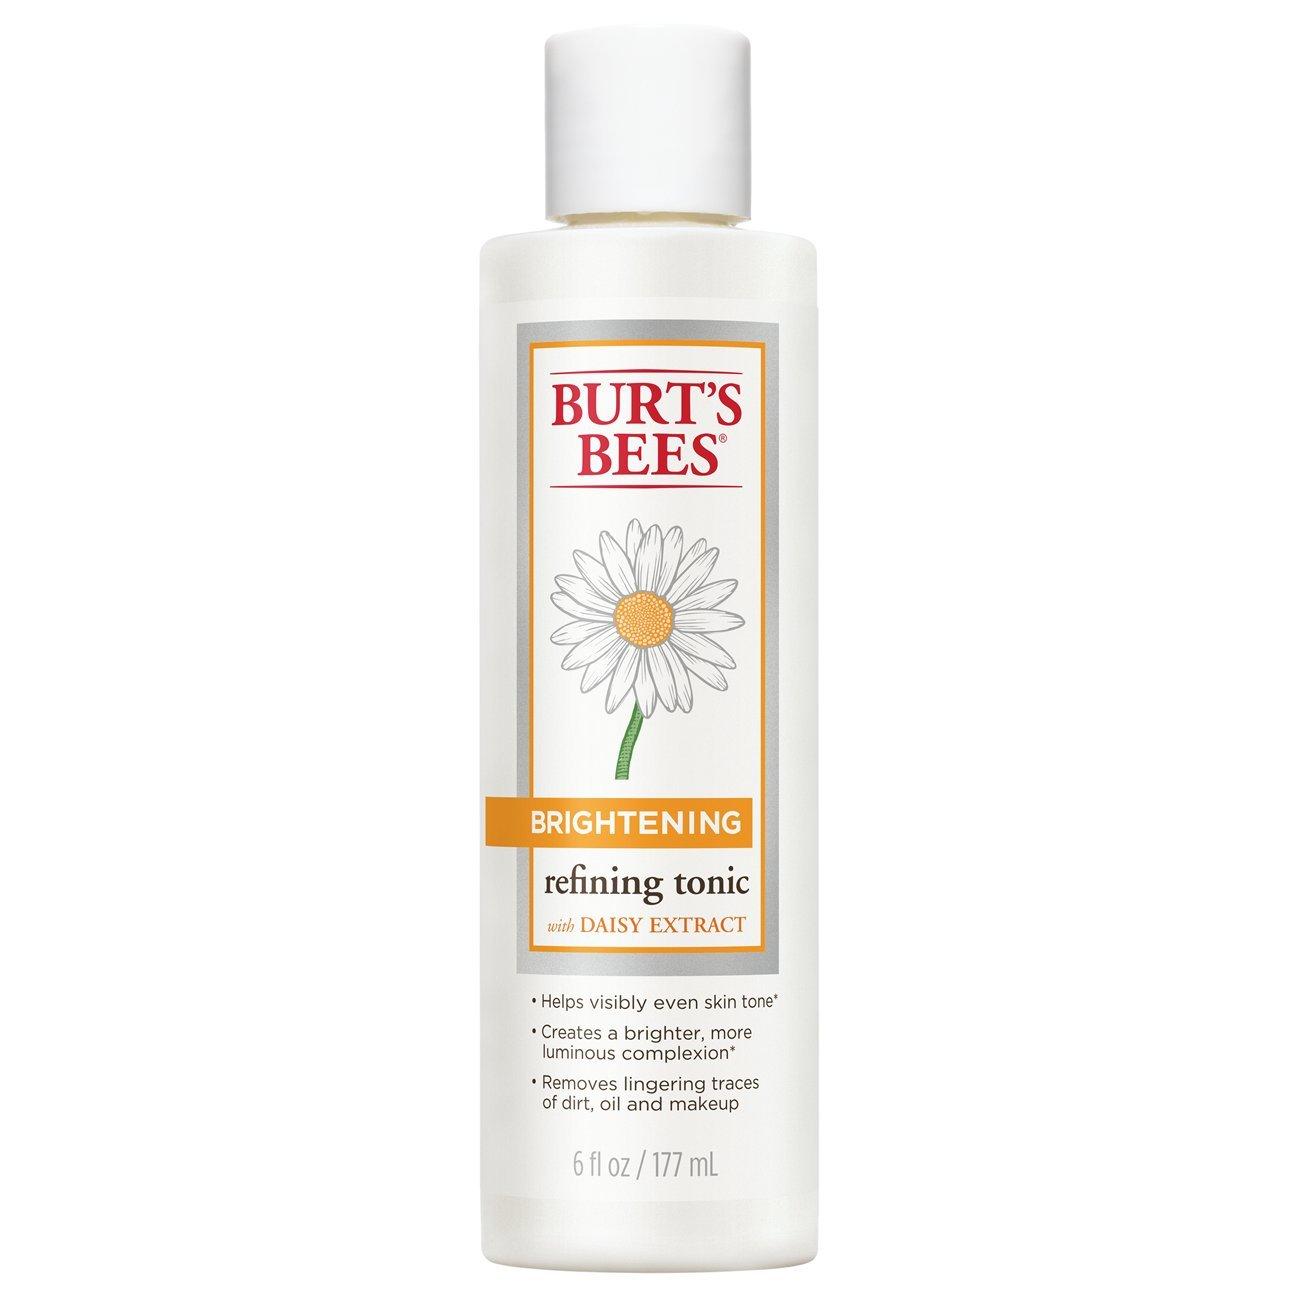 Burt's Bees Brightening Refining Tonic, 6 Ounces